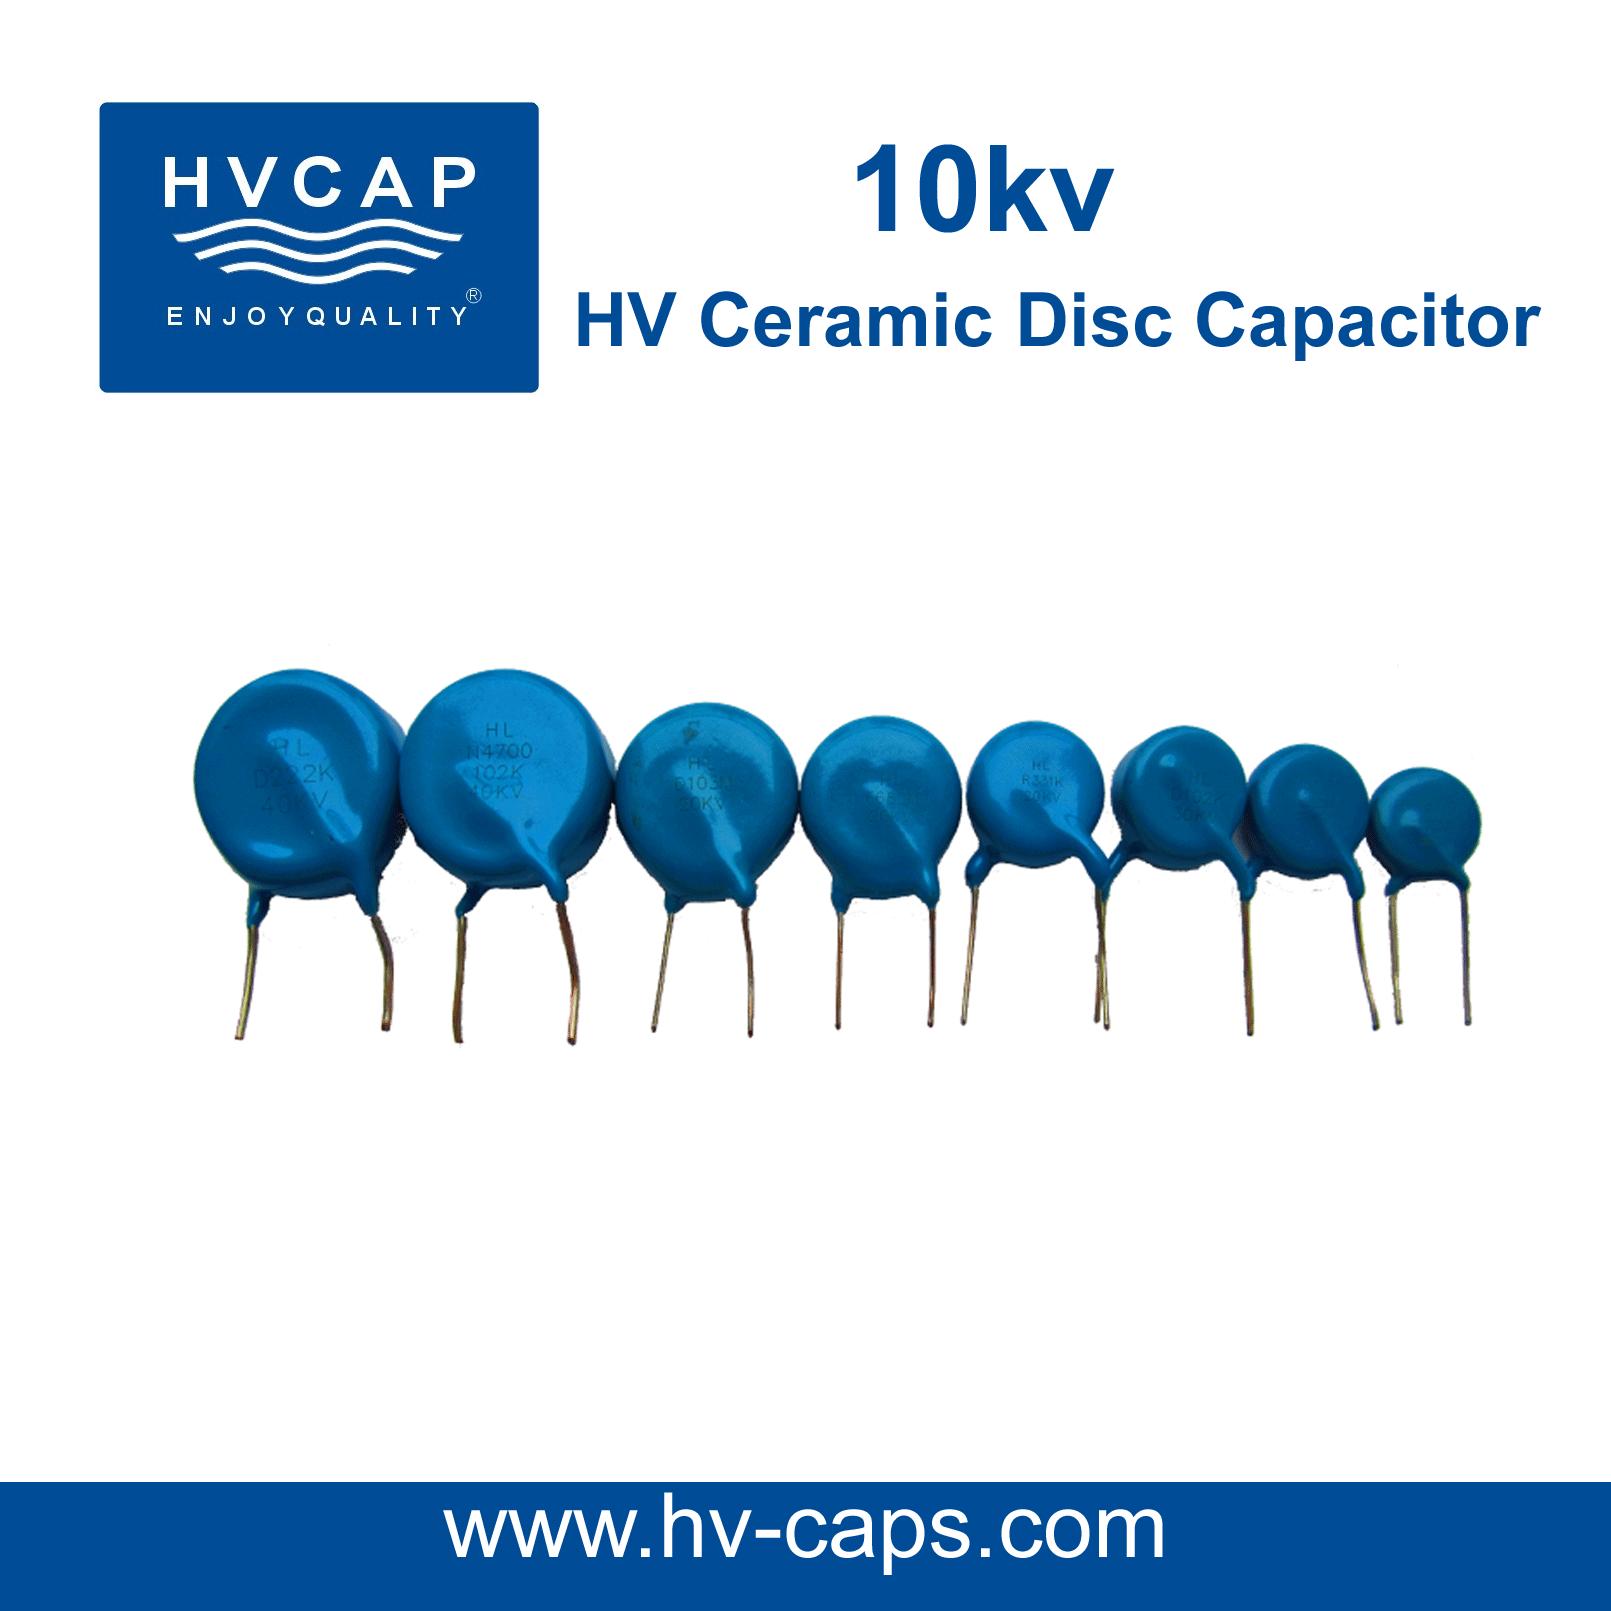 High Voltage Keramiek Kapasitor 10kv detail spesifikasie.